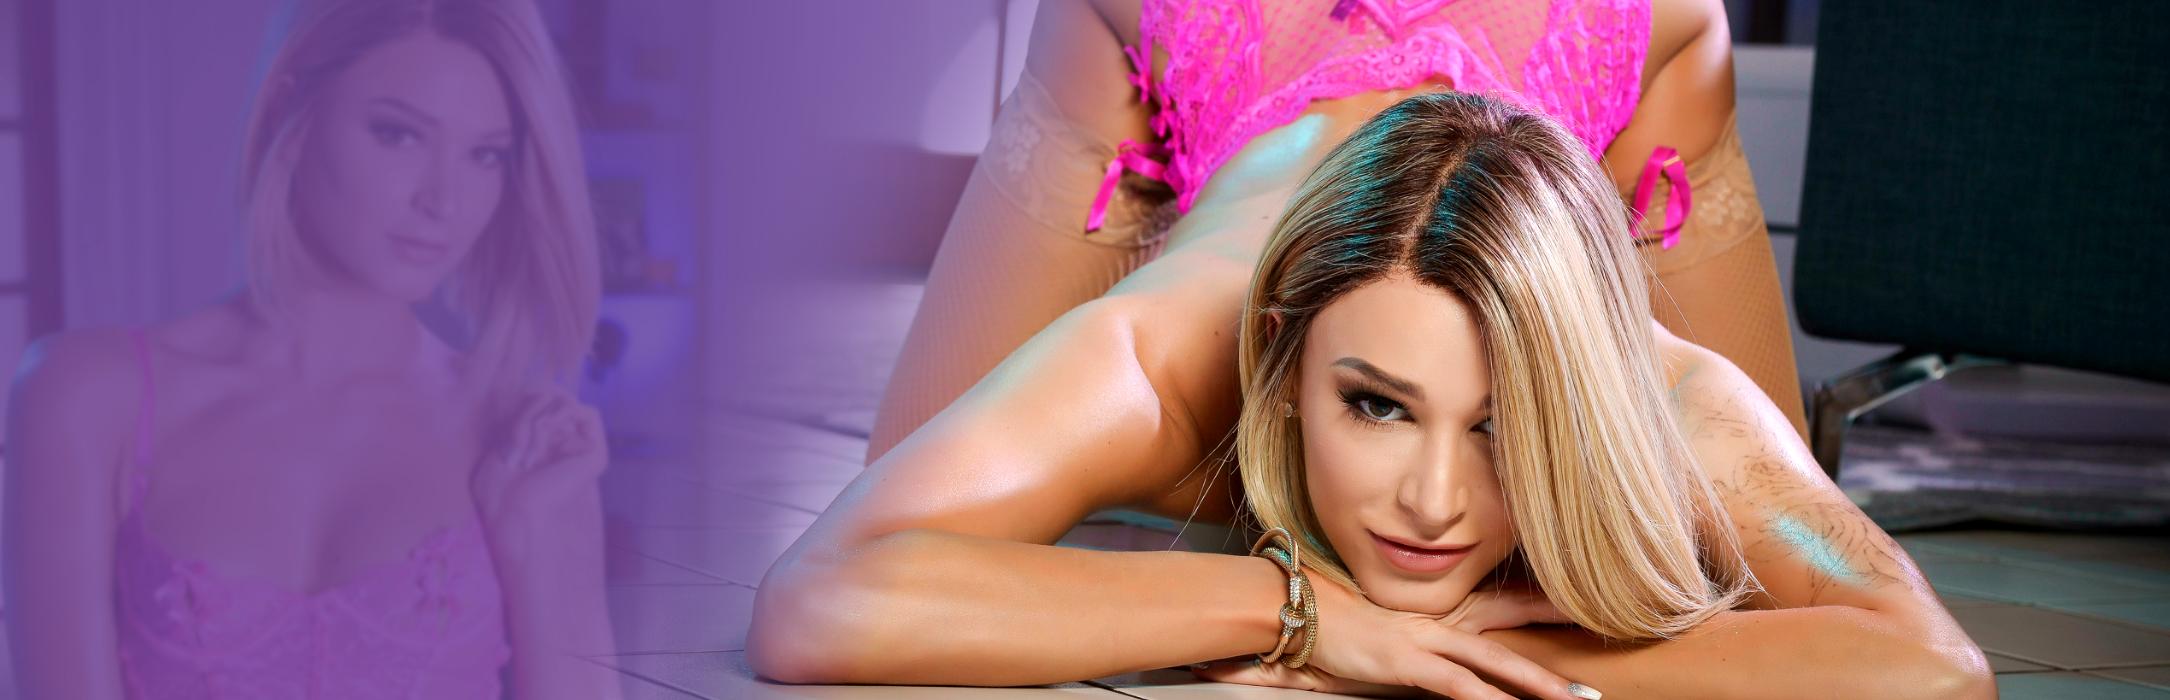 Bikini Beauties Pornstars